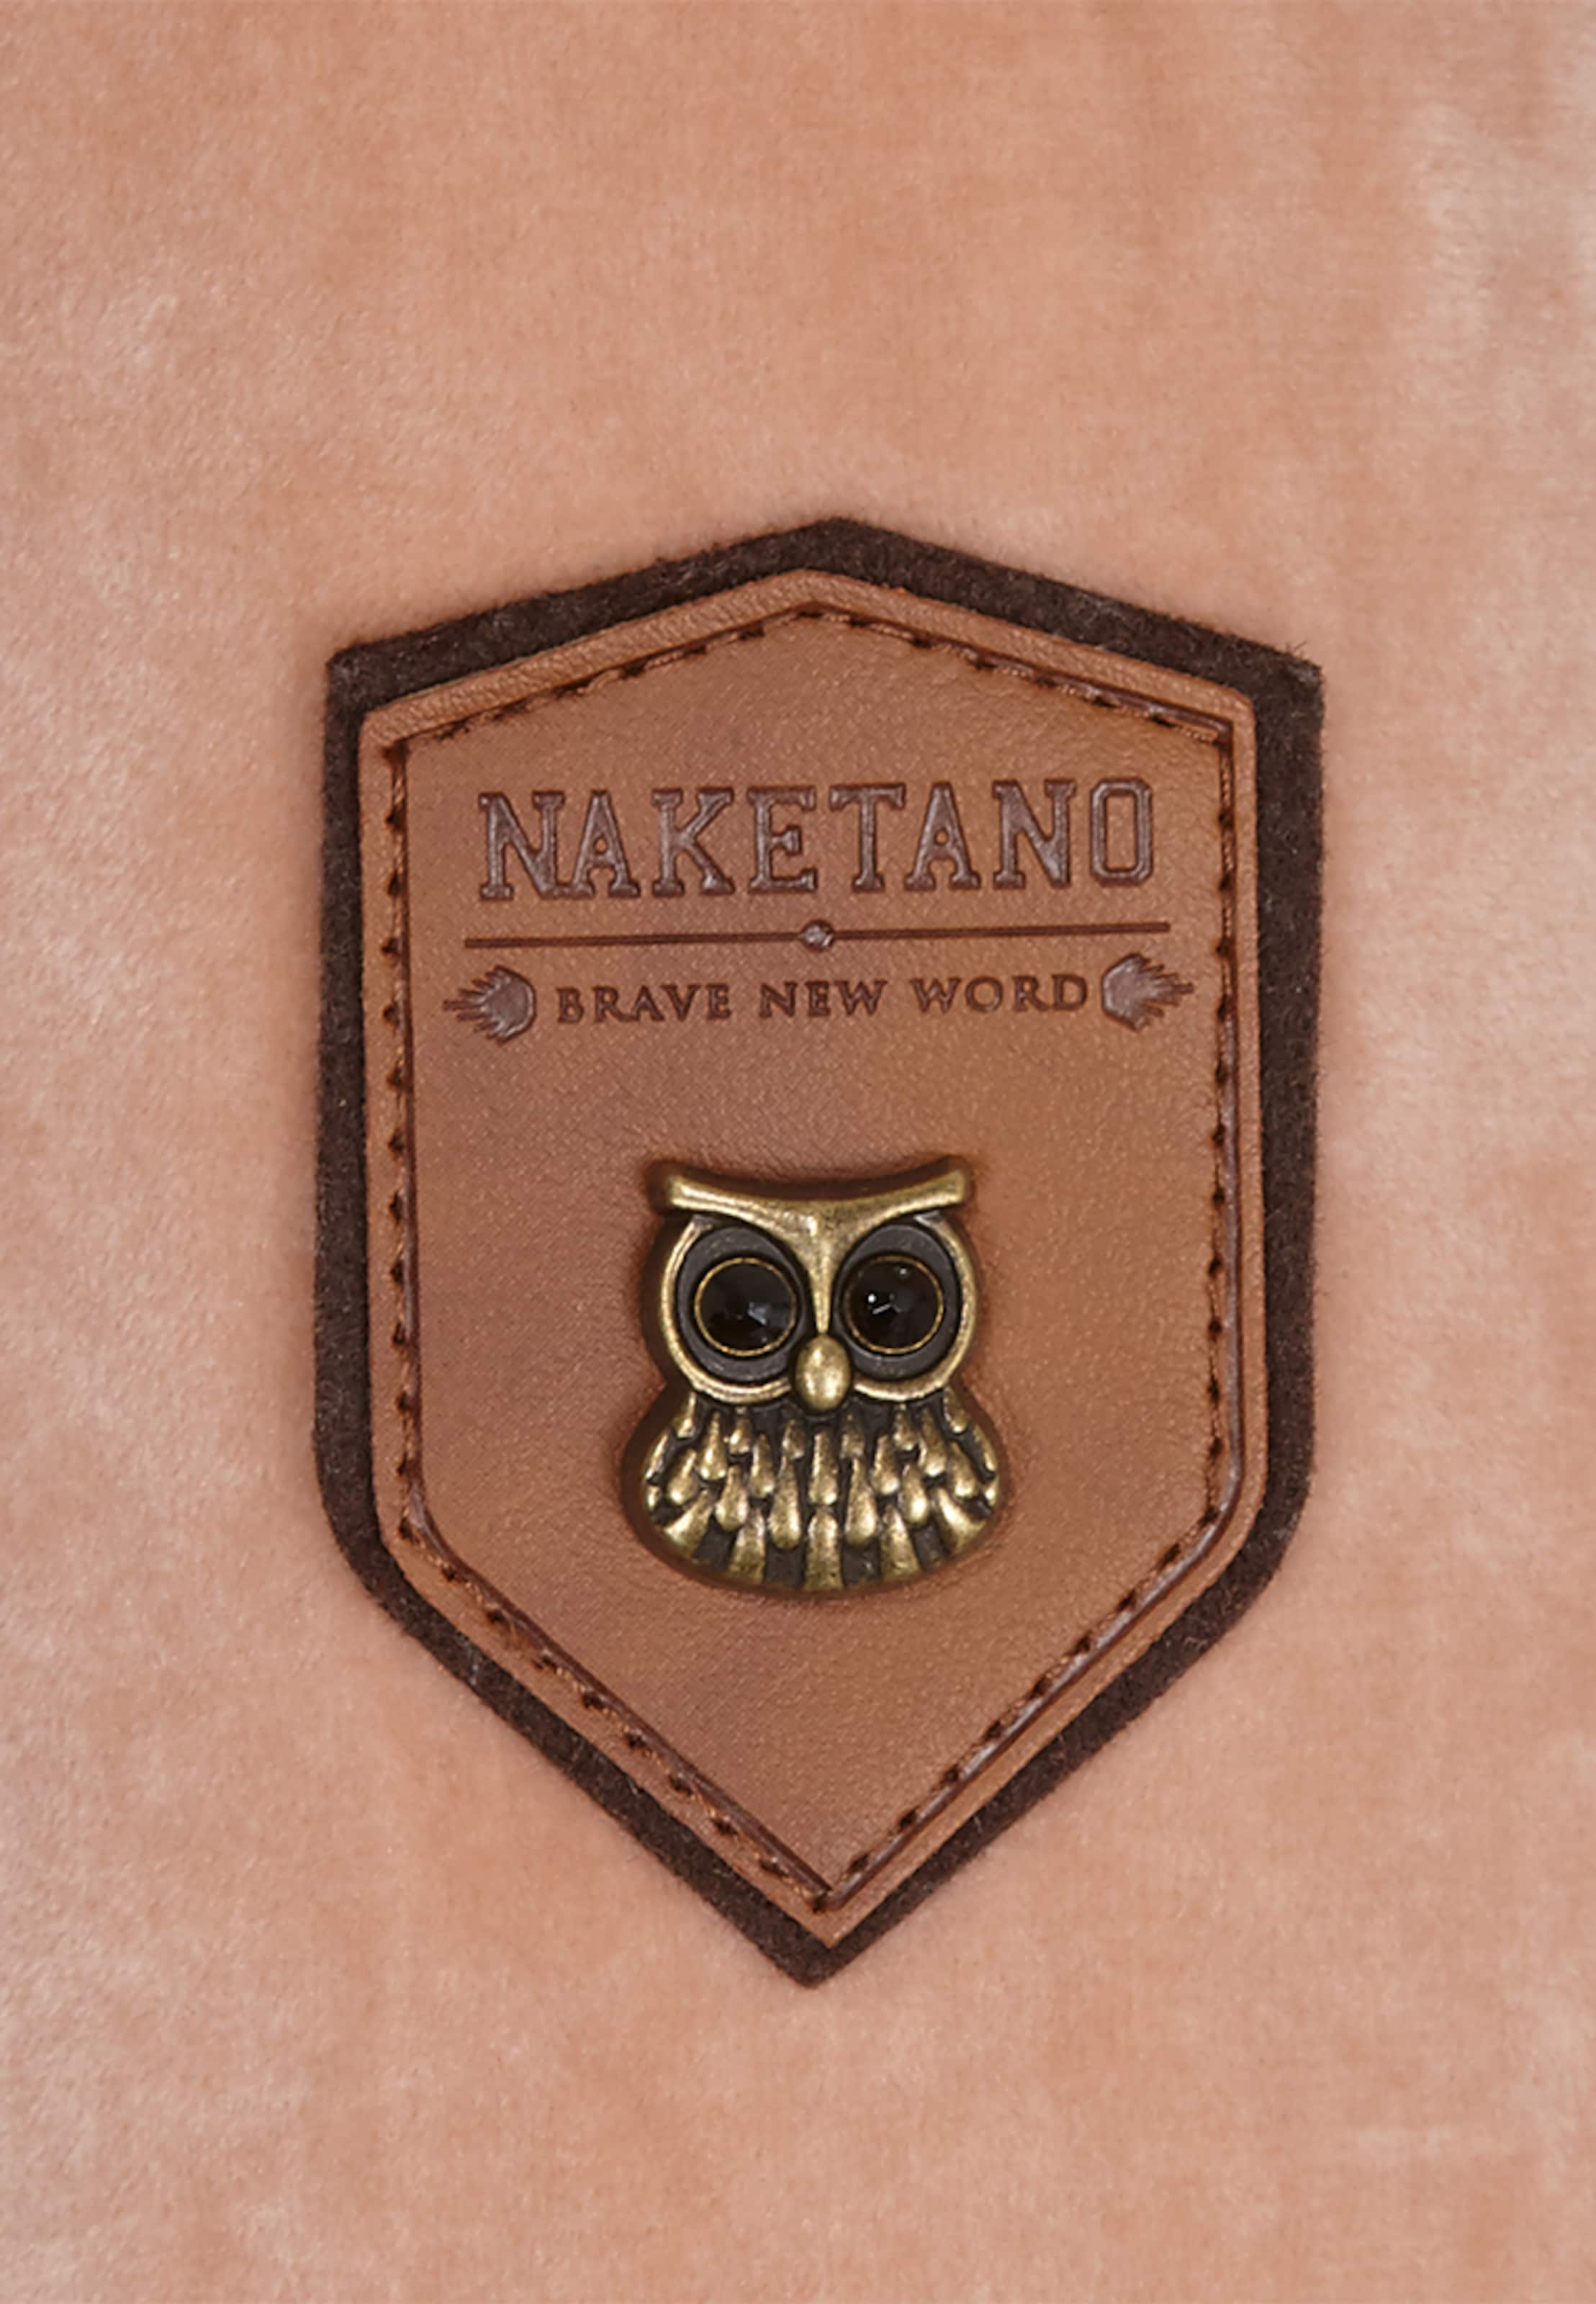 shirt Sweat Rose Naketano En Ancienne eEIYWDH29